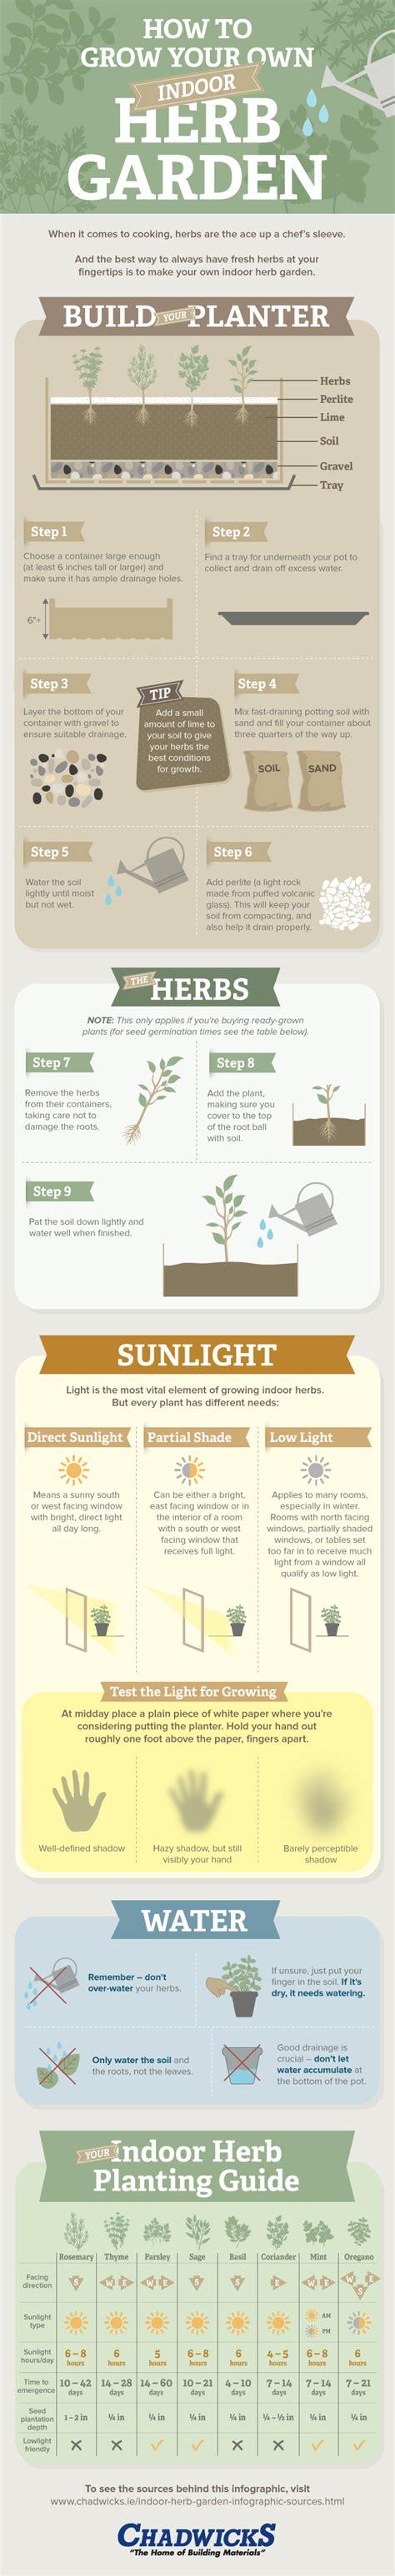 how to grow herbs indoors how to grow your own indoor herb garden chadwicks blog